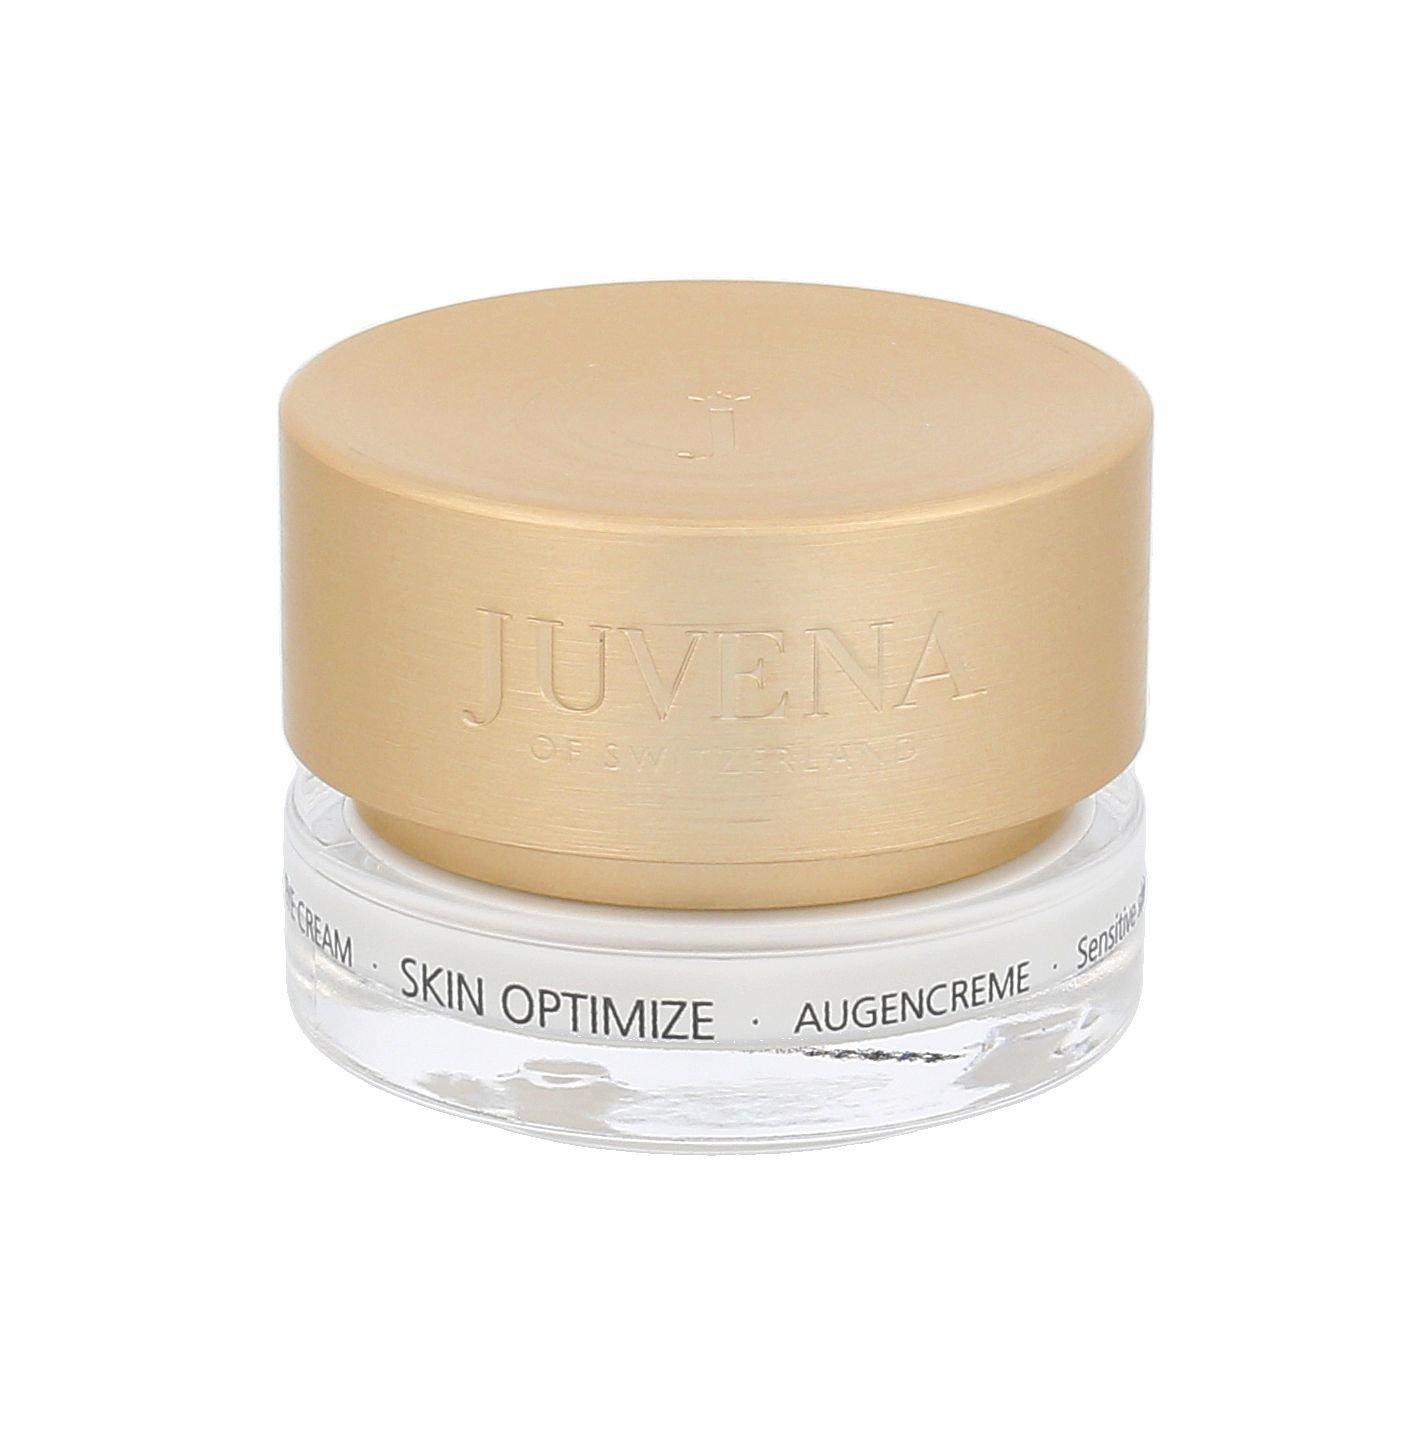 Juvena Skin Optimize Eye Cream Sensitive